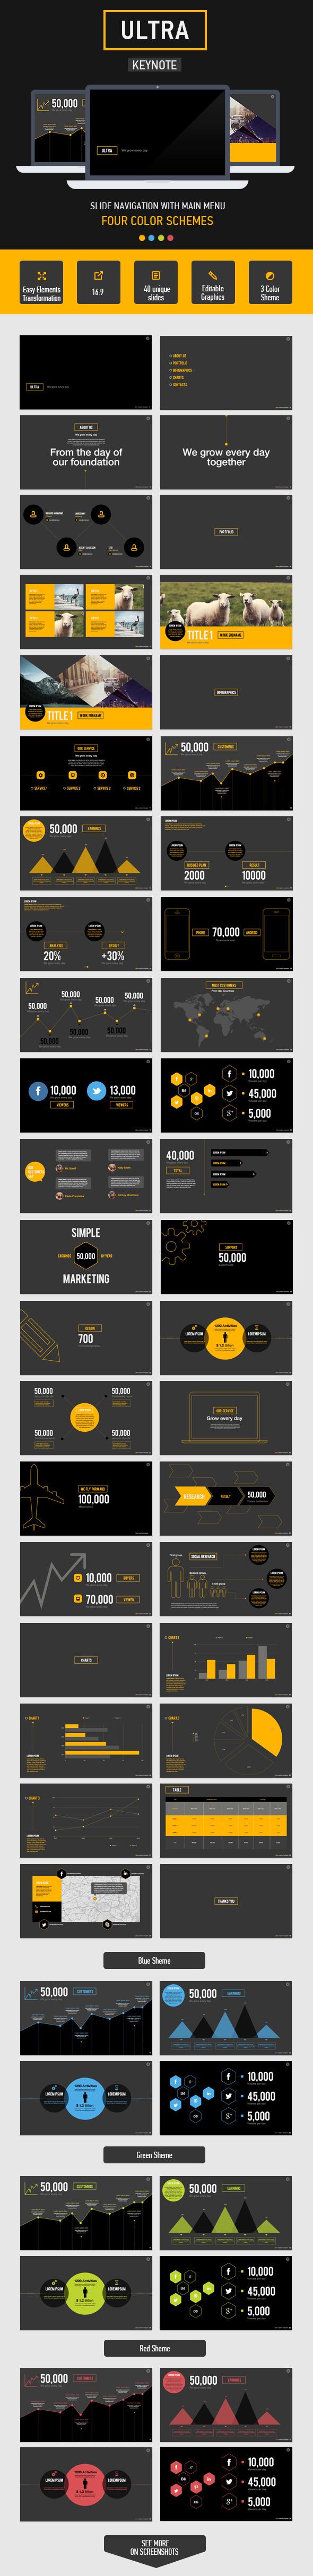 Ultra Keynote Template - Creative Keynote Templates